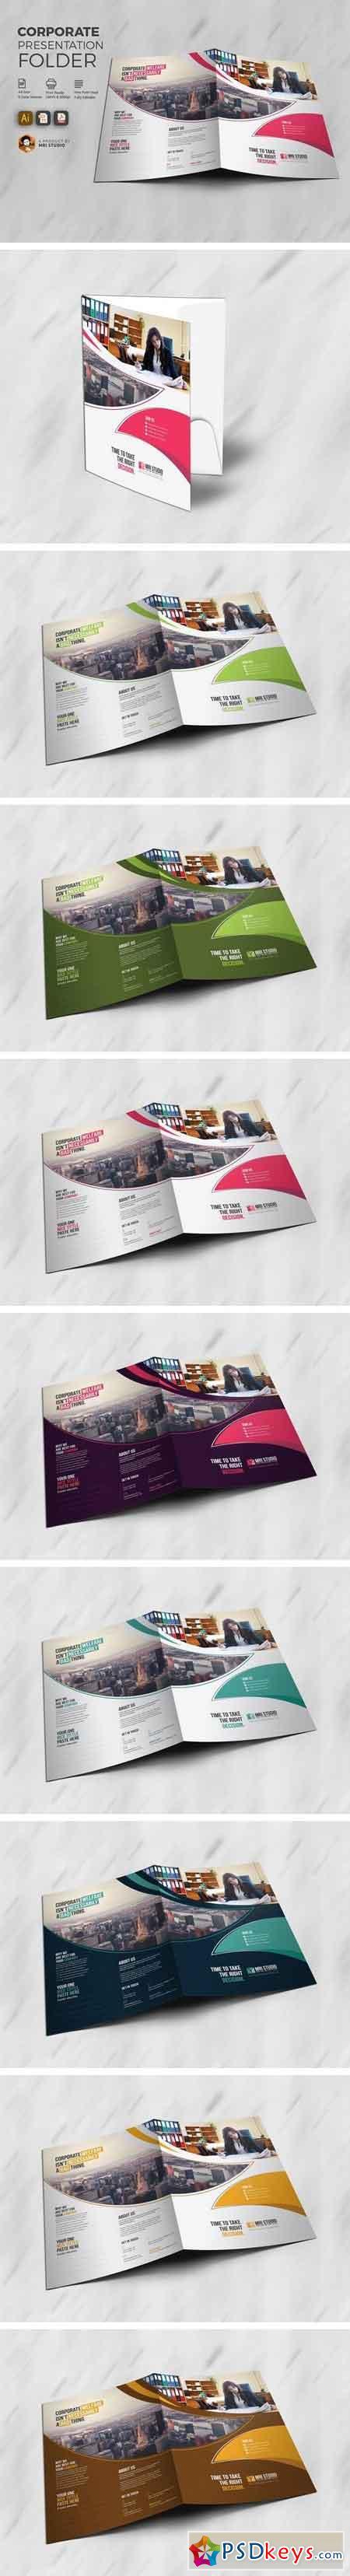 Creative Presentation Folder 1541962